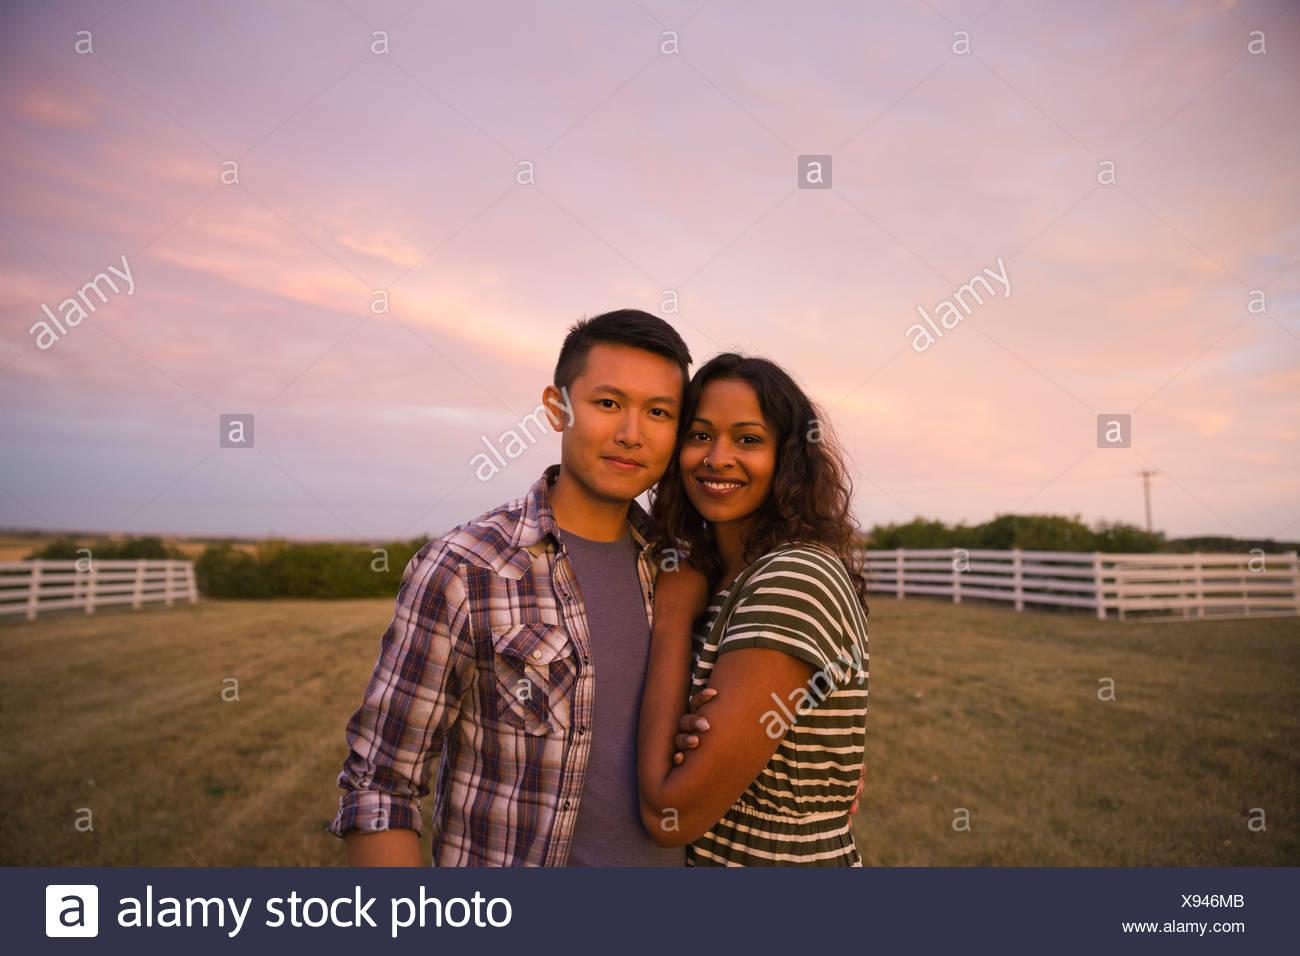 Retrato de pareja multiétnico de pie afuera Imagen De Stock